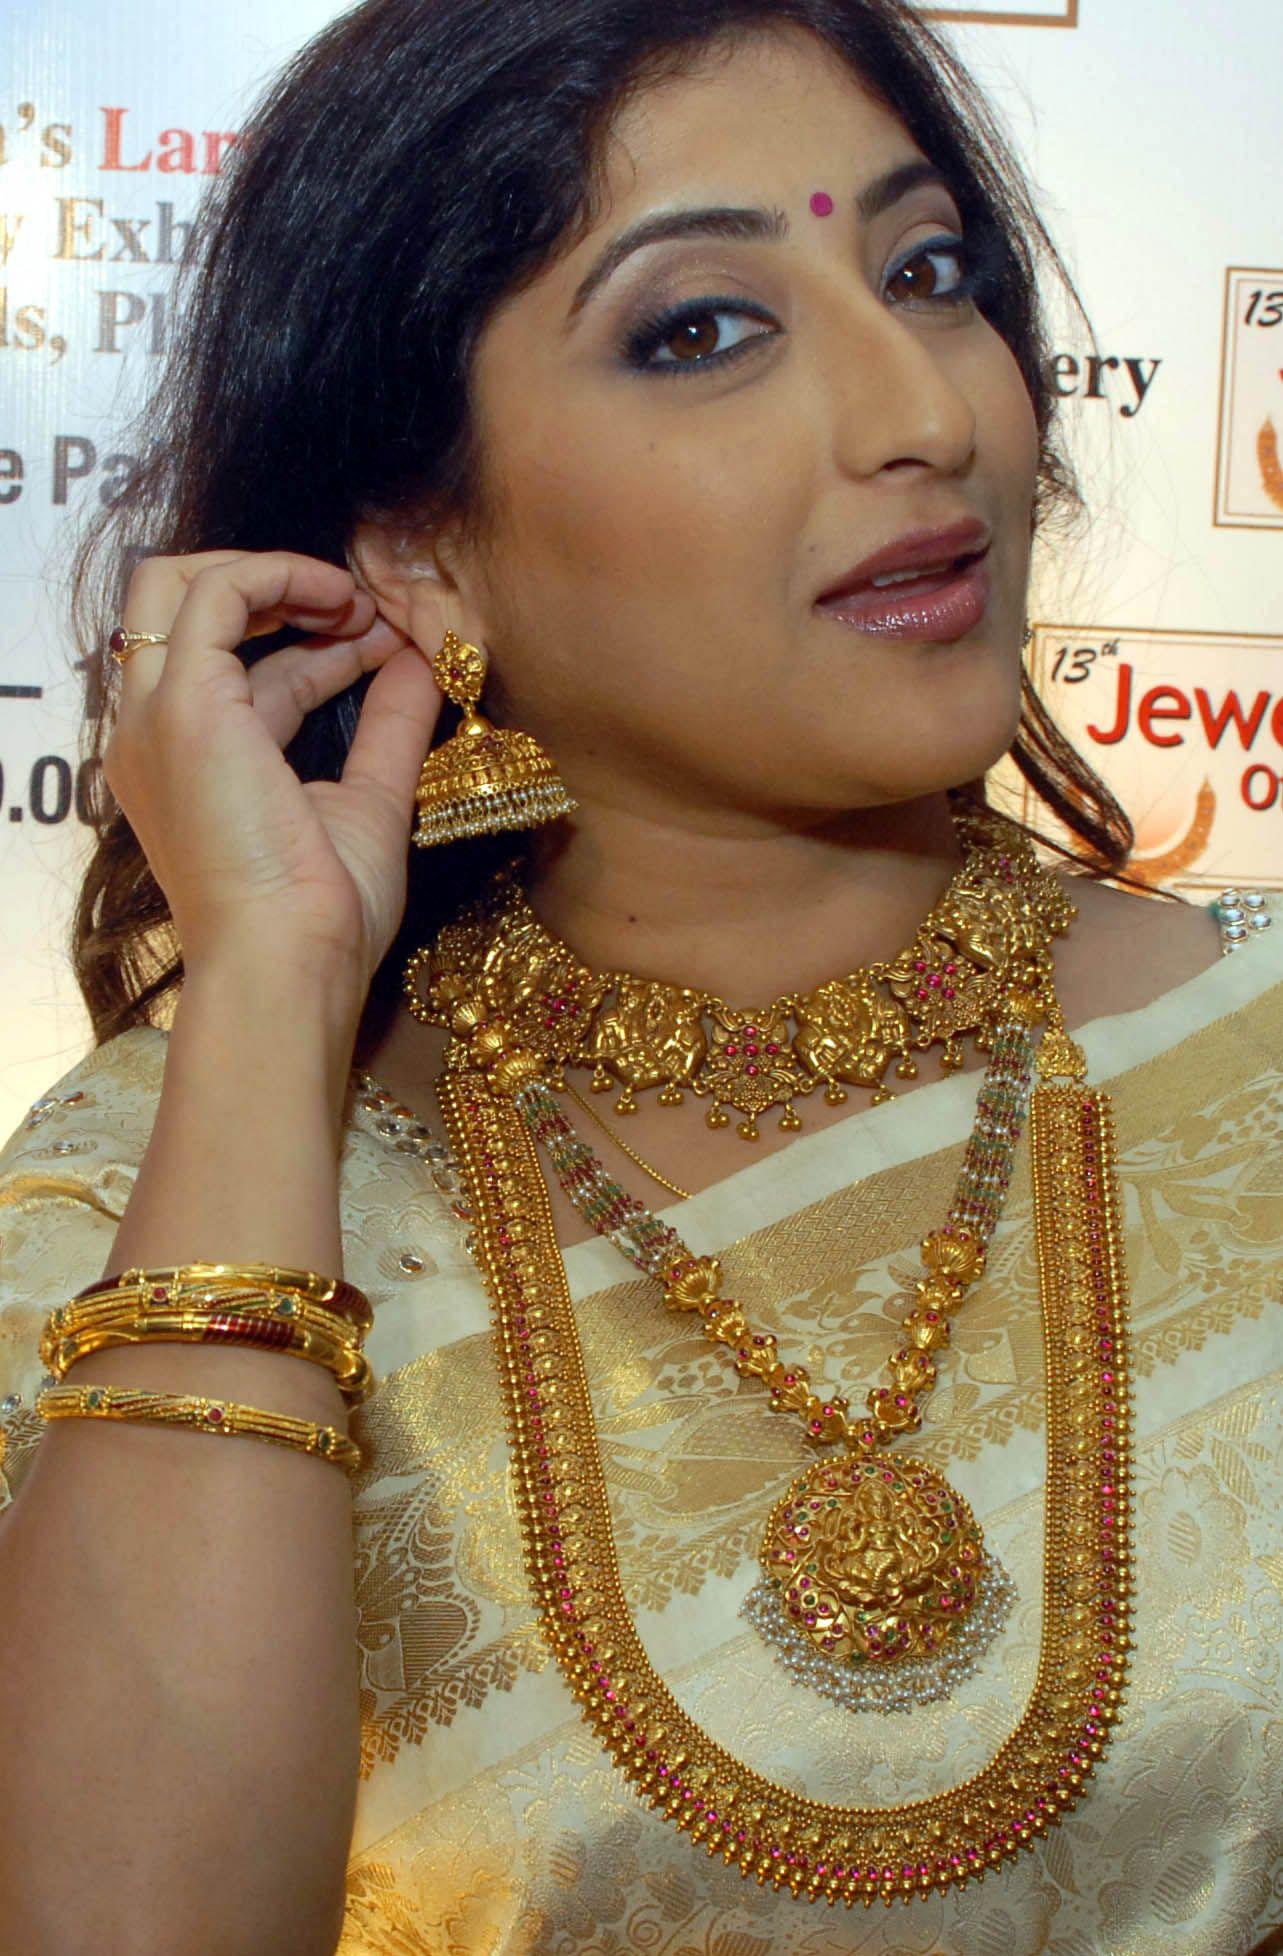 lakshmi gopalaswamy and vineeth film